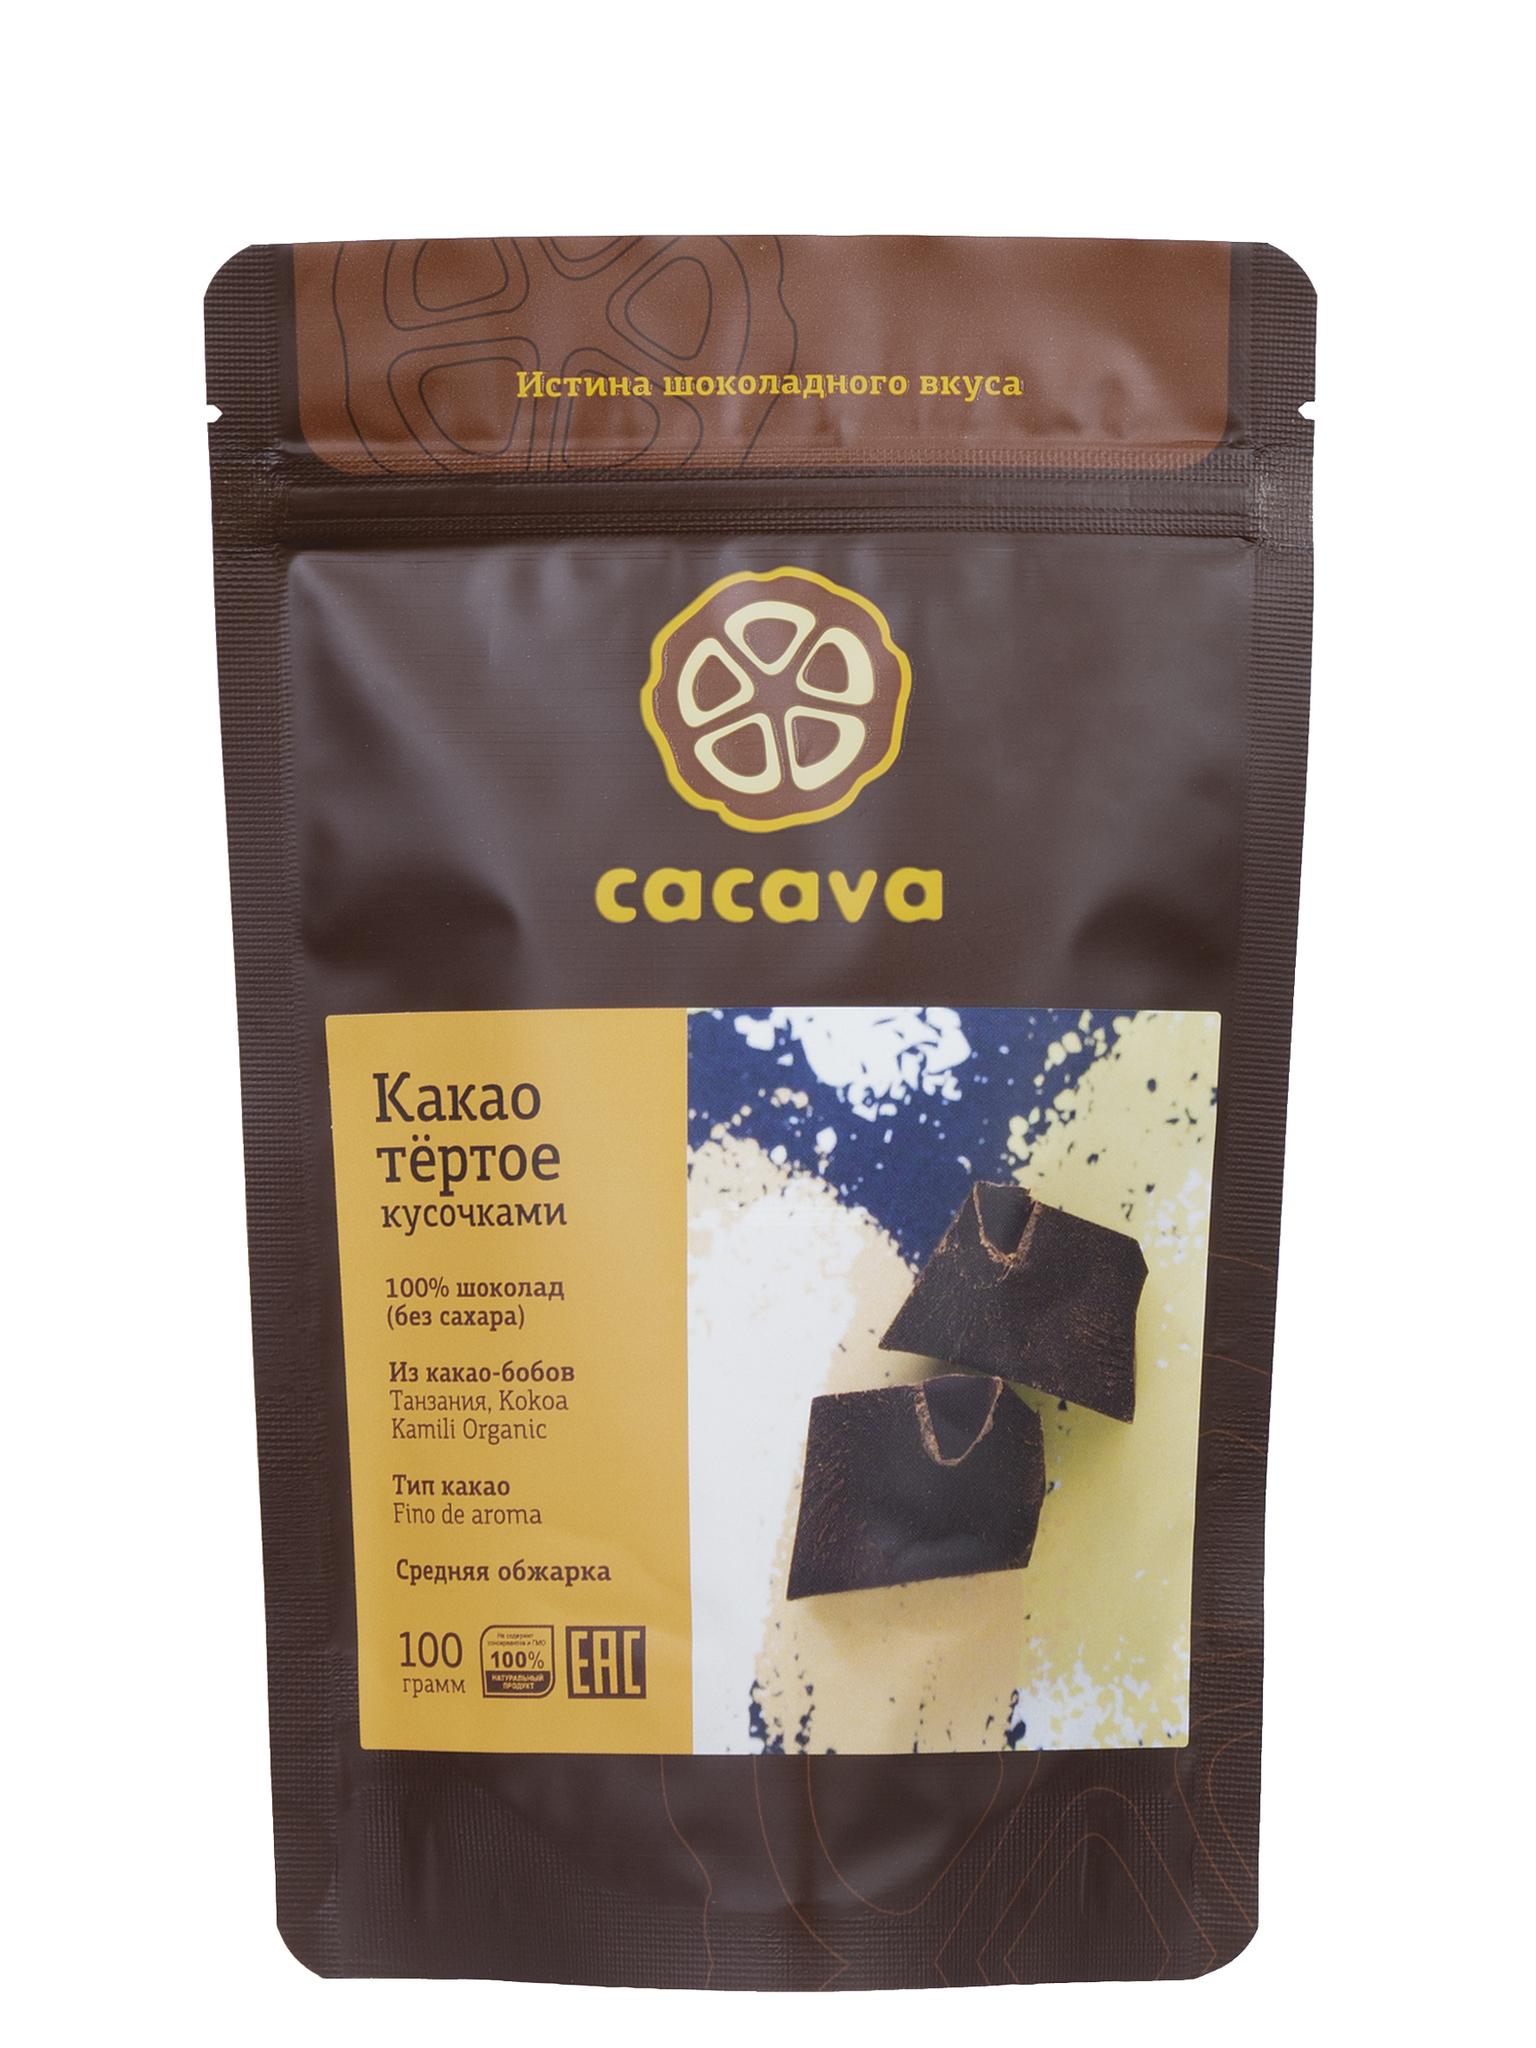 Какао тёртое кусочками (Танзания, Kokoa Kamili), упаковка 100 грамм